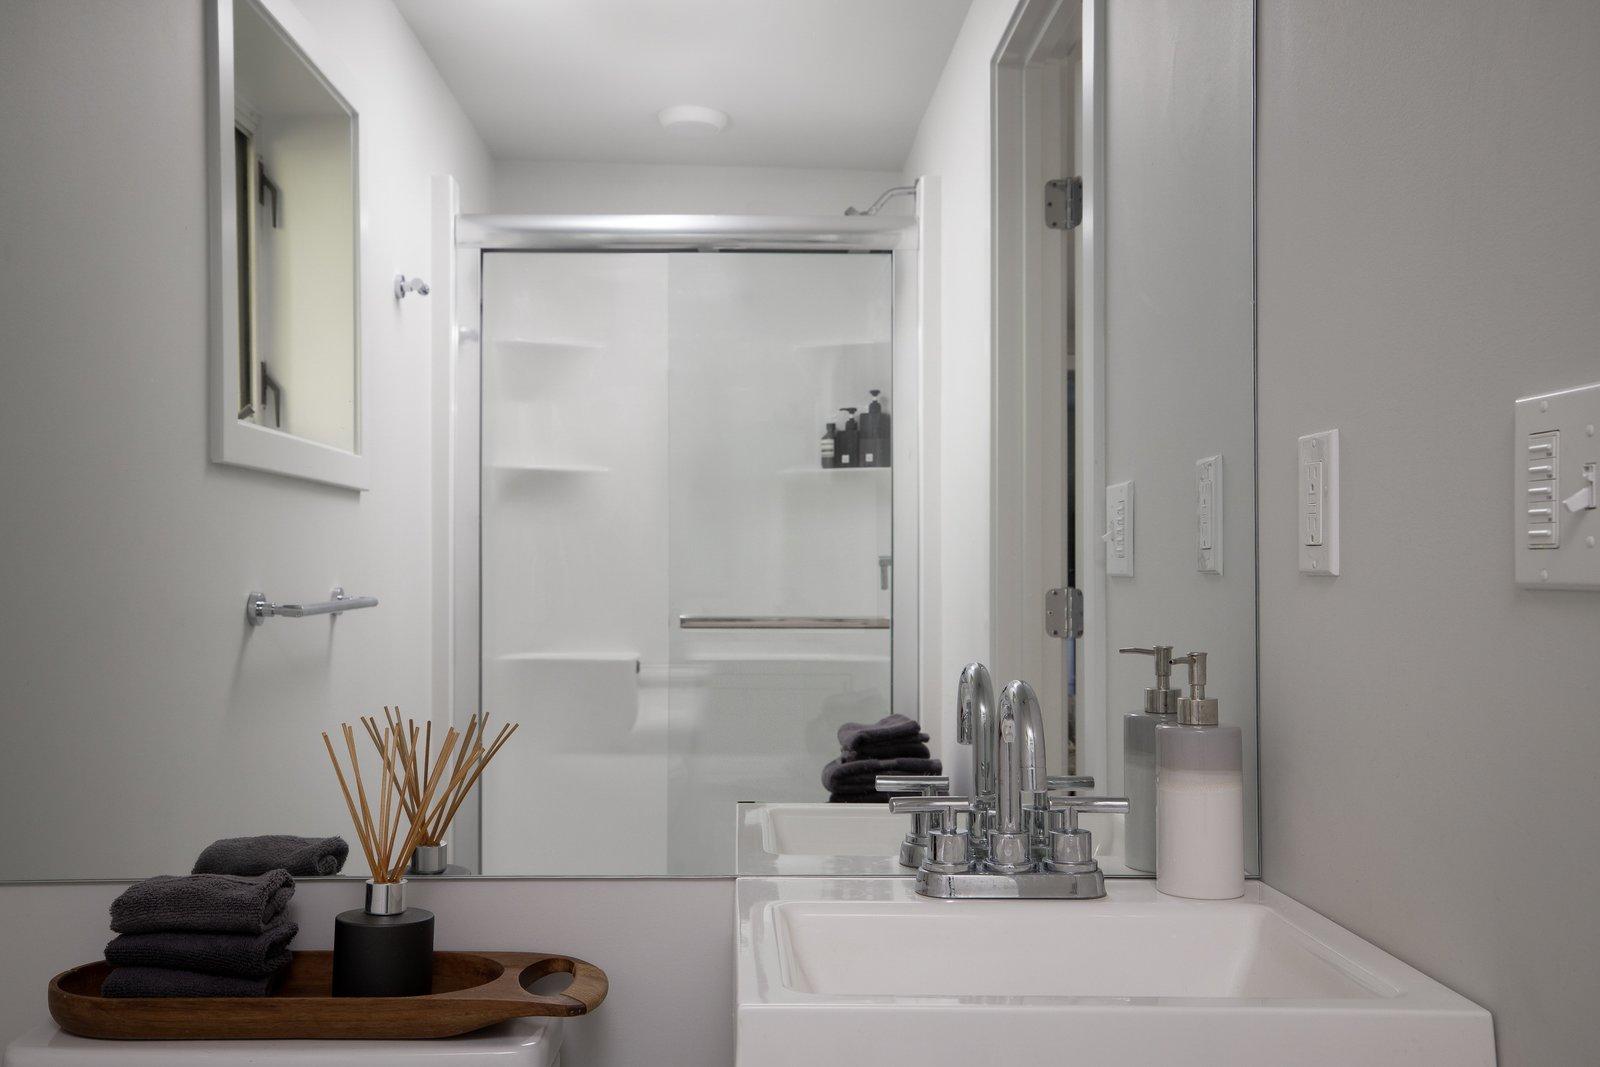 New England–style cottage bathroom